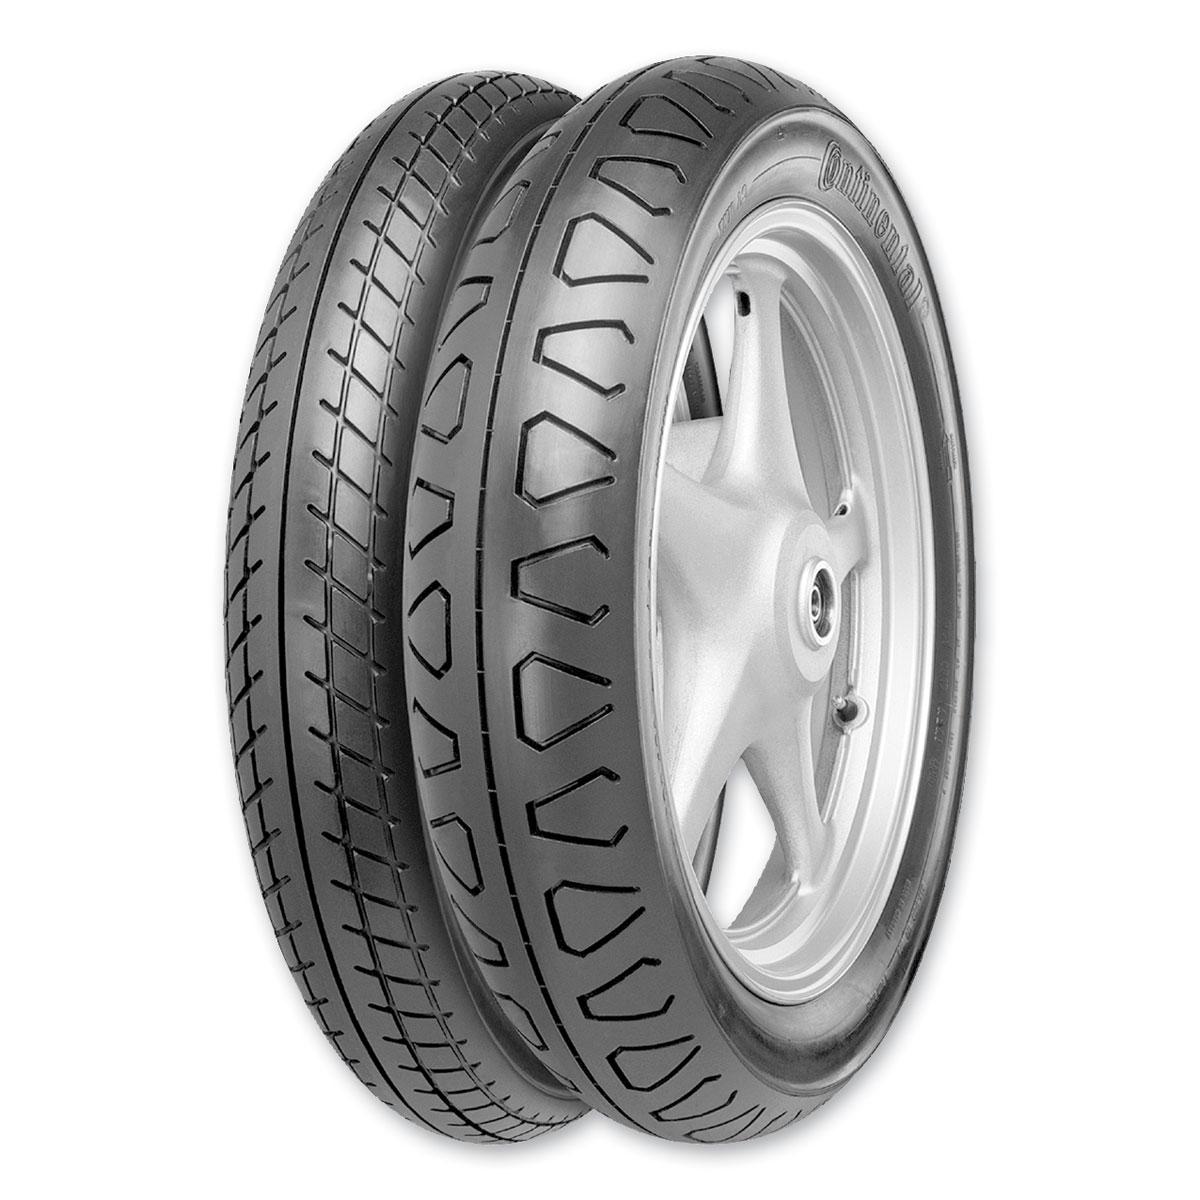 Continental TKV12 110/90H18 Rear Tire